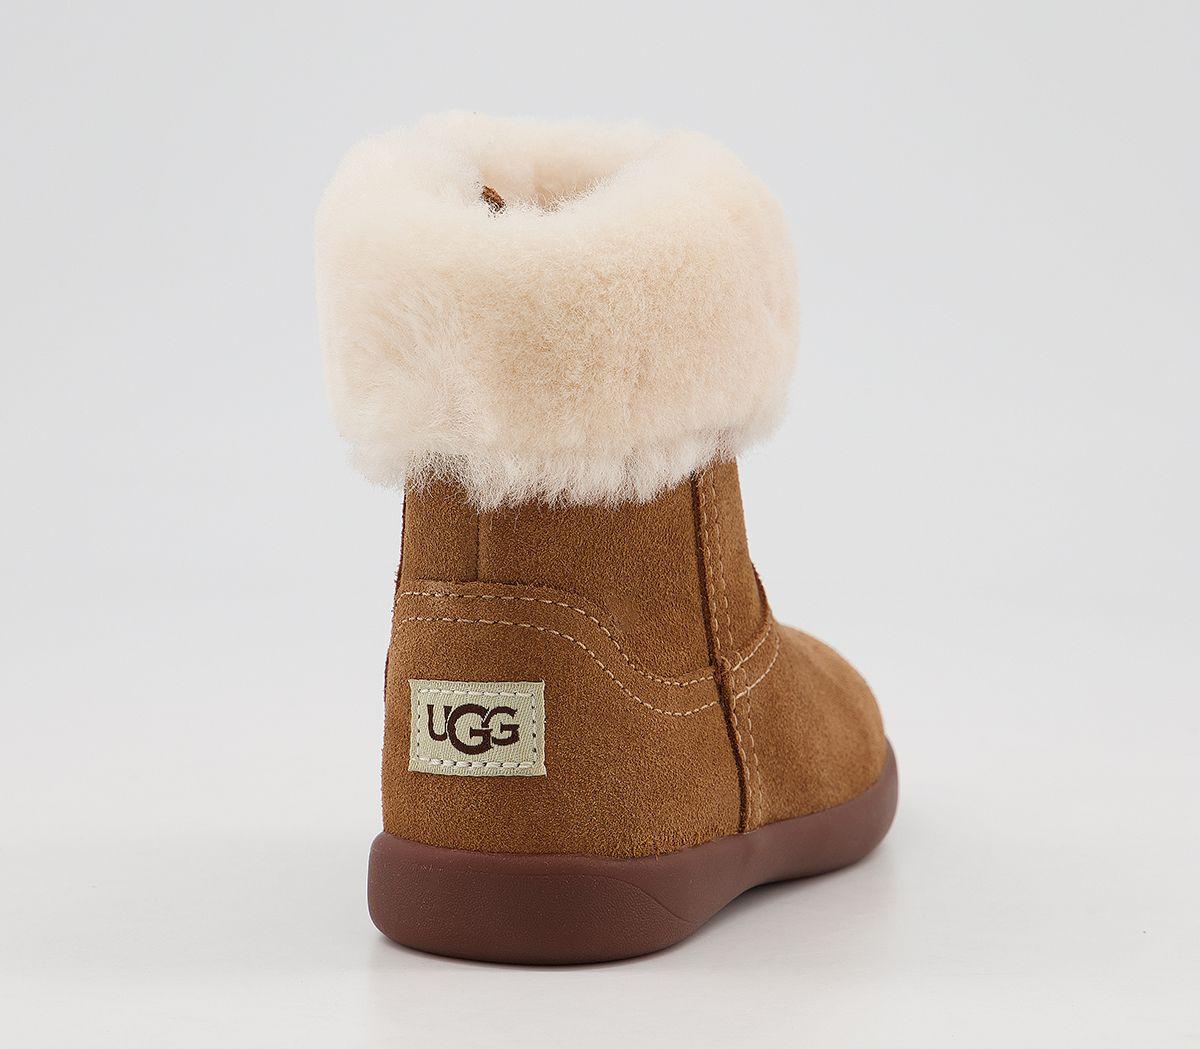 930f7698f UGG Jorie II Boots Chestnut - Unisex